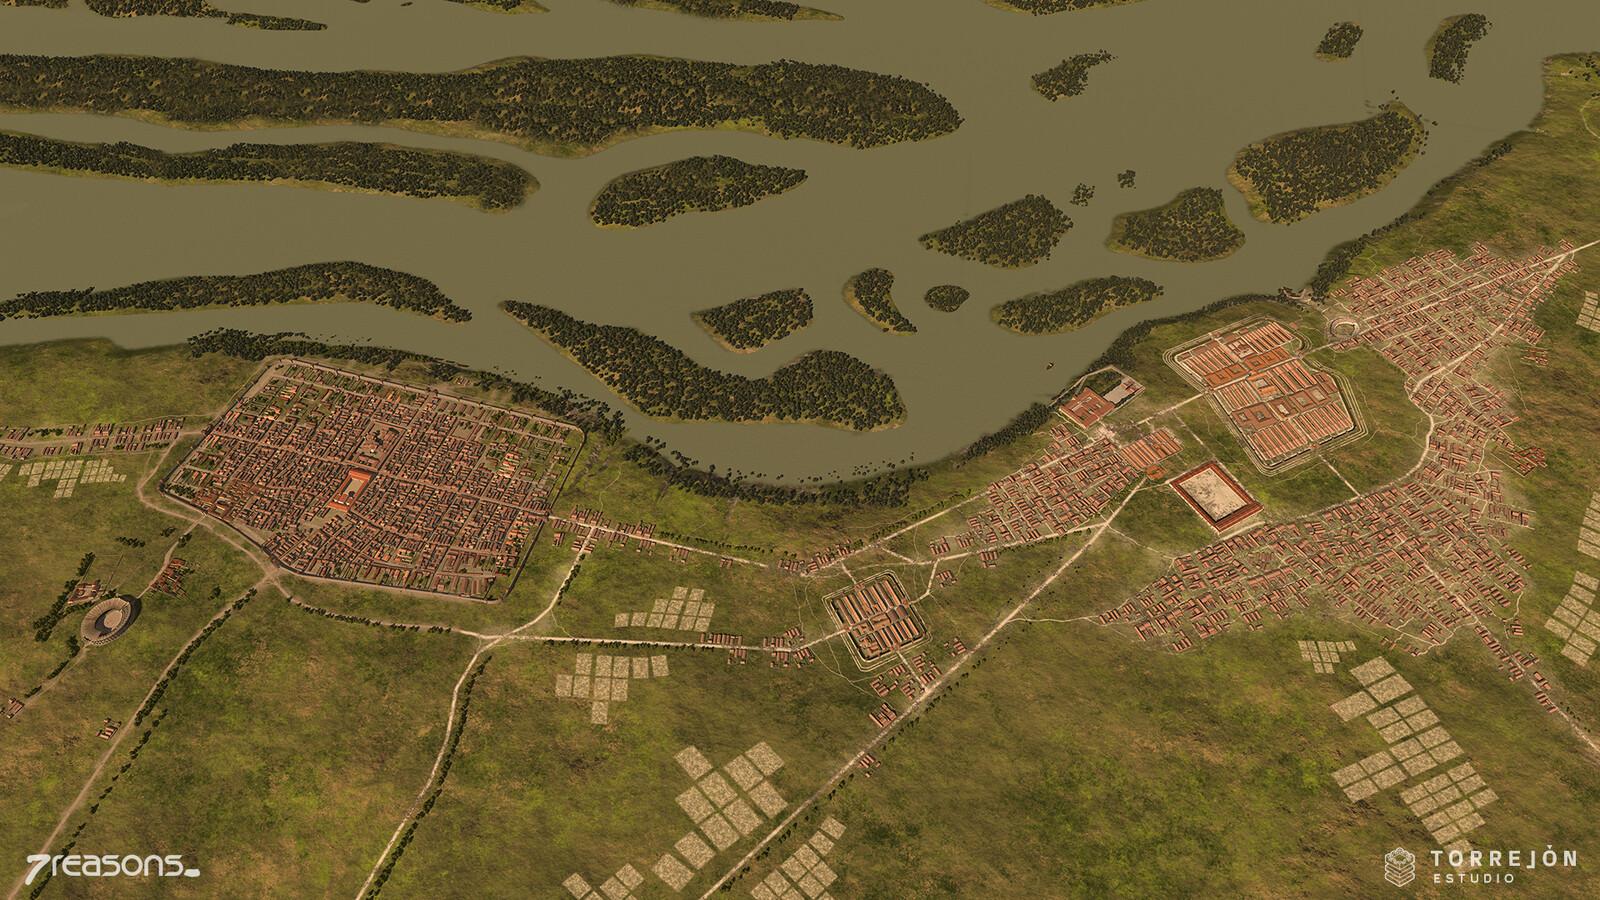 Carnuntum - Landscape 3D visualisation